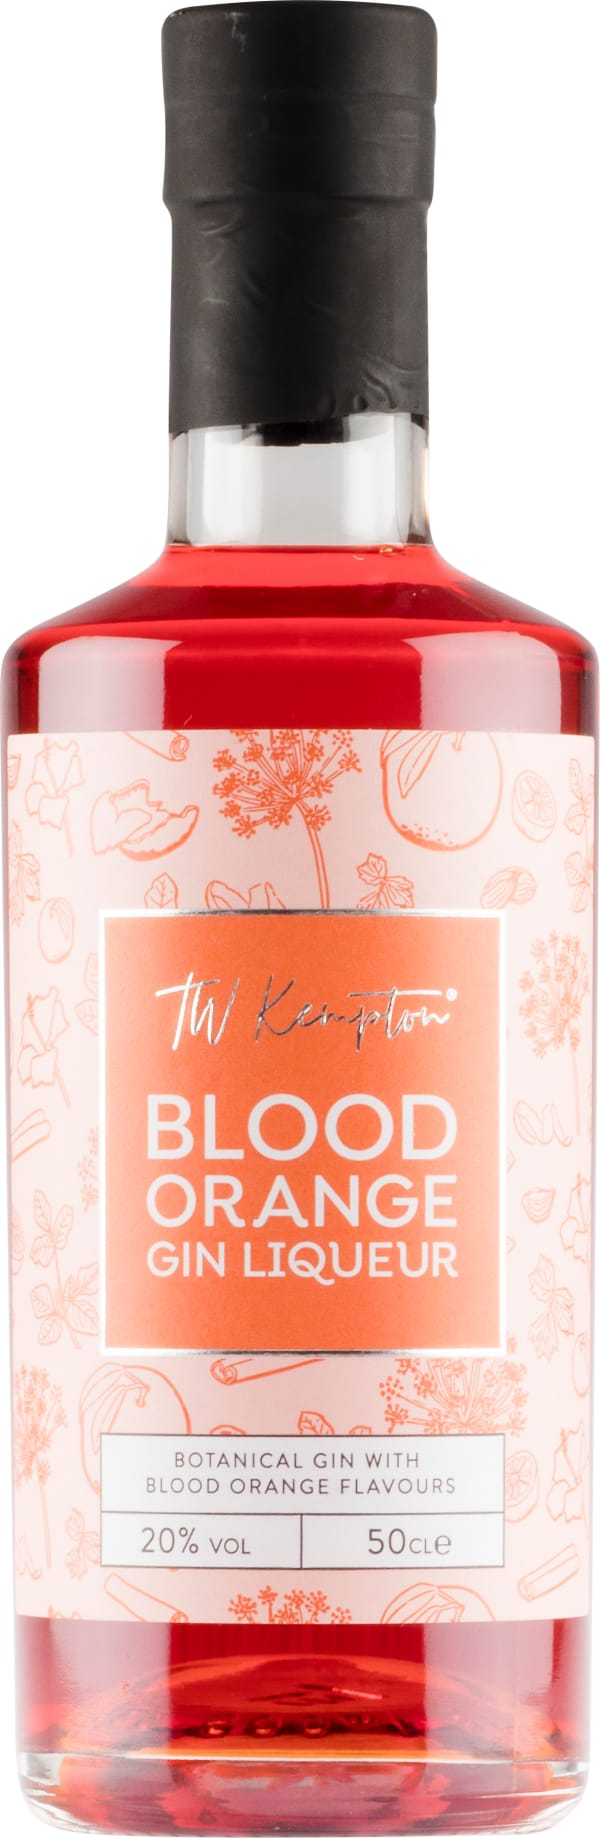 TW Kempton Blood Orange Gin Liqueur